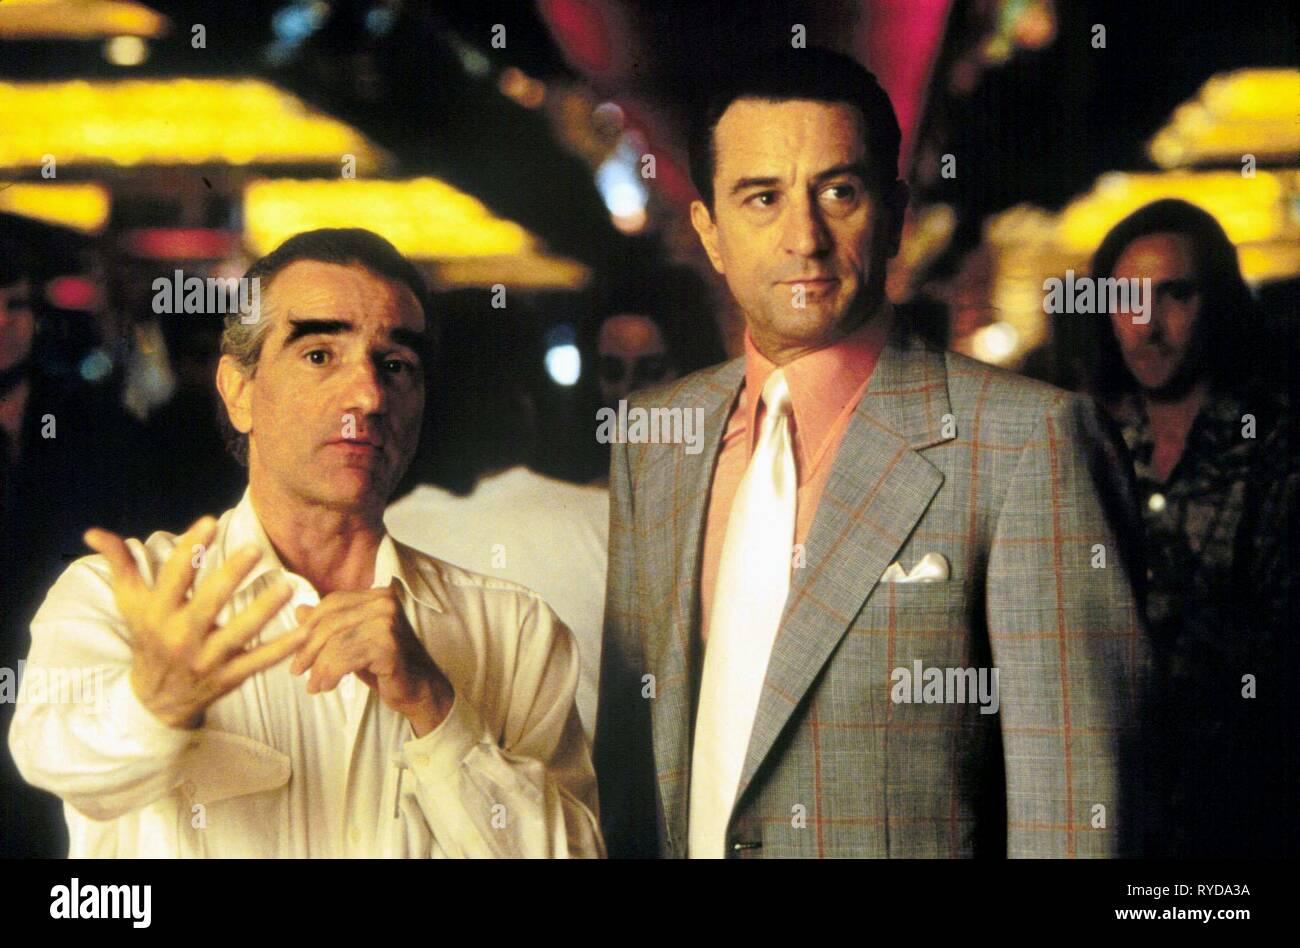 Martin Scorsese Robert De Niro Casino 1995 Stock Photo